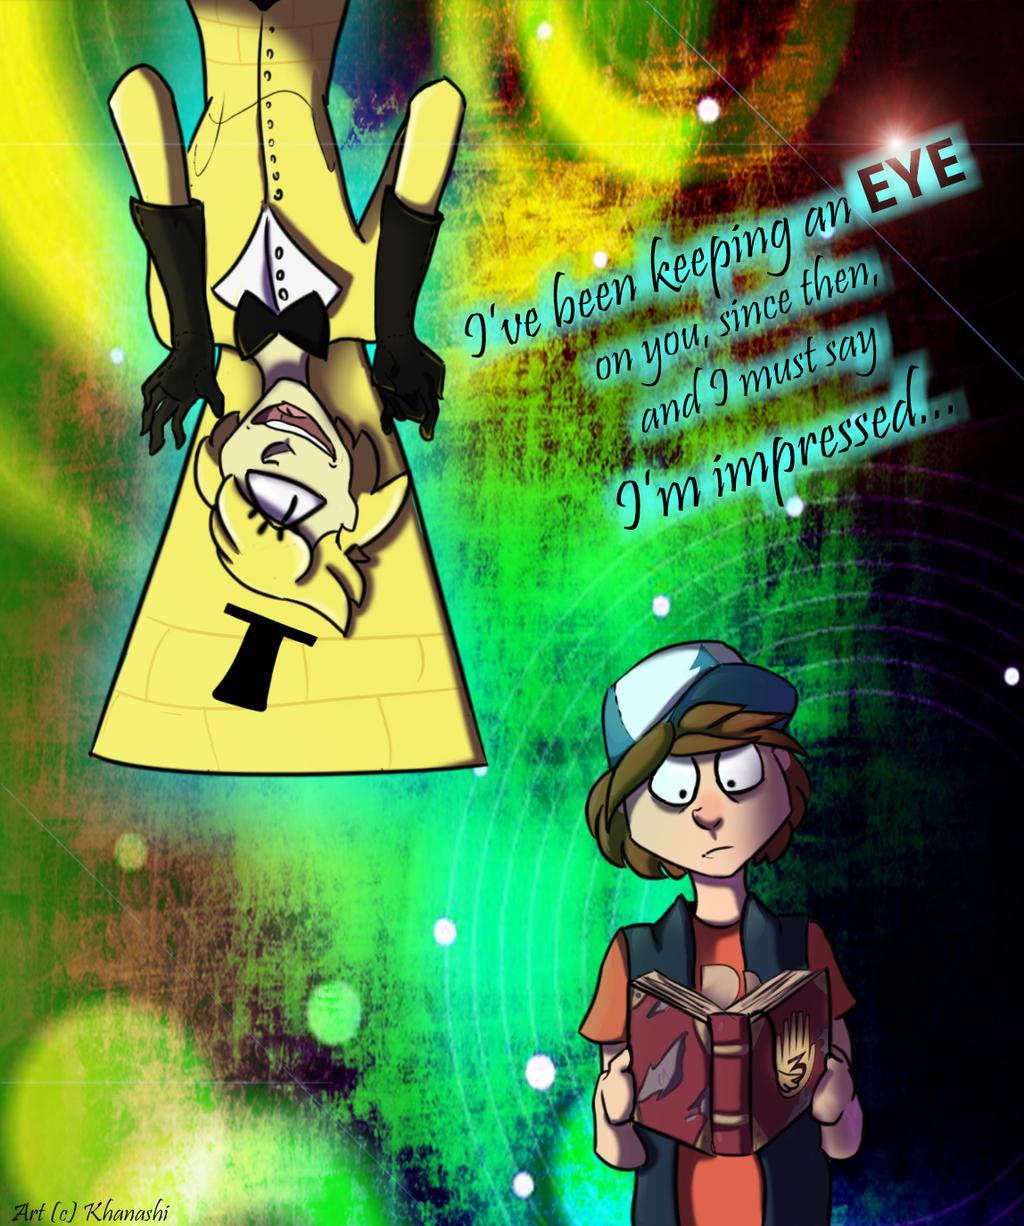   Gravity Falls Fanart   Impressed by Khanashi on DeviantArt